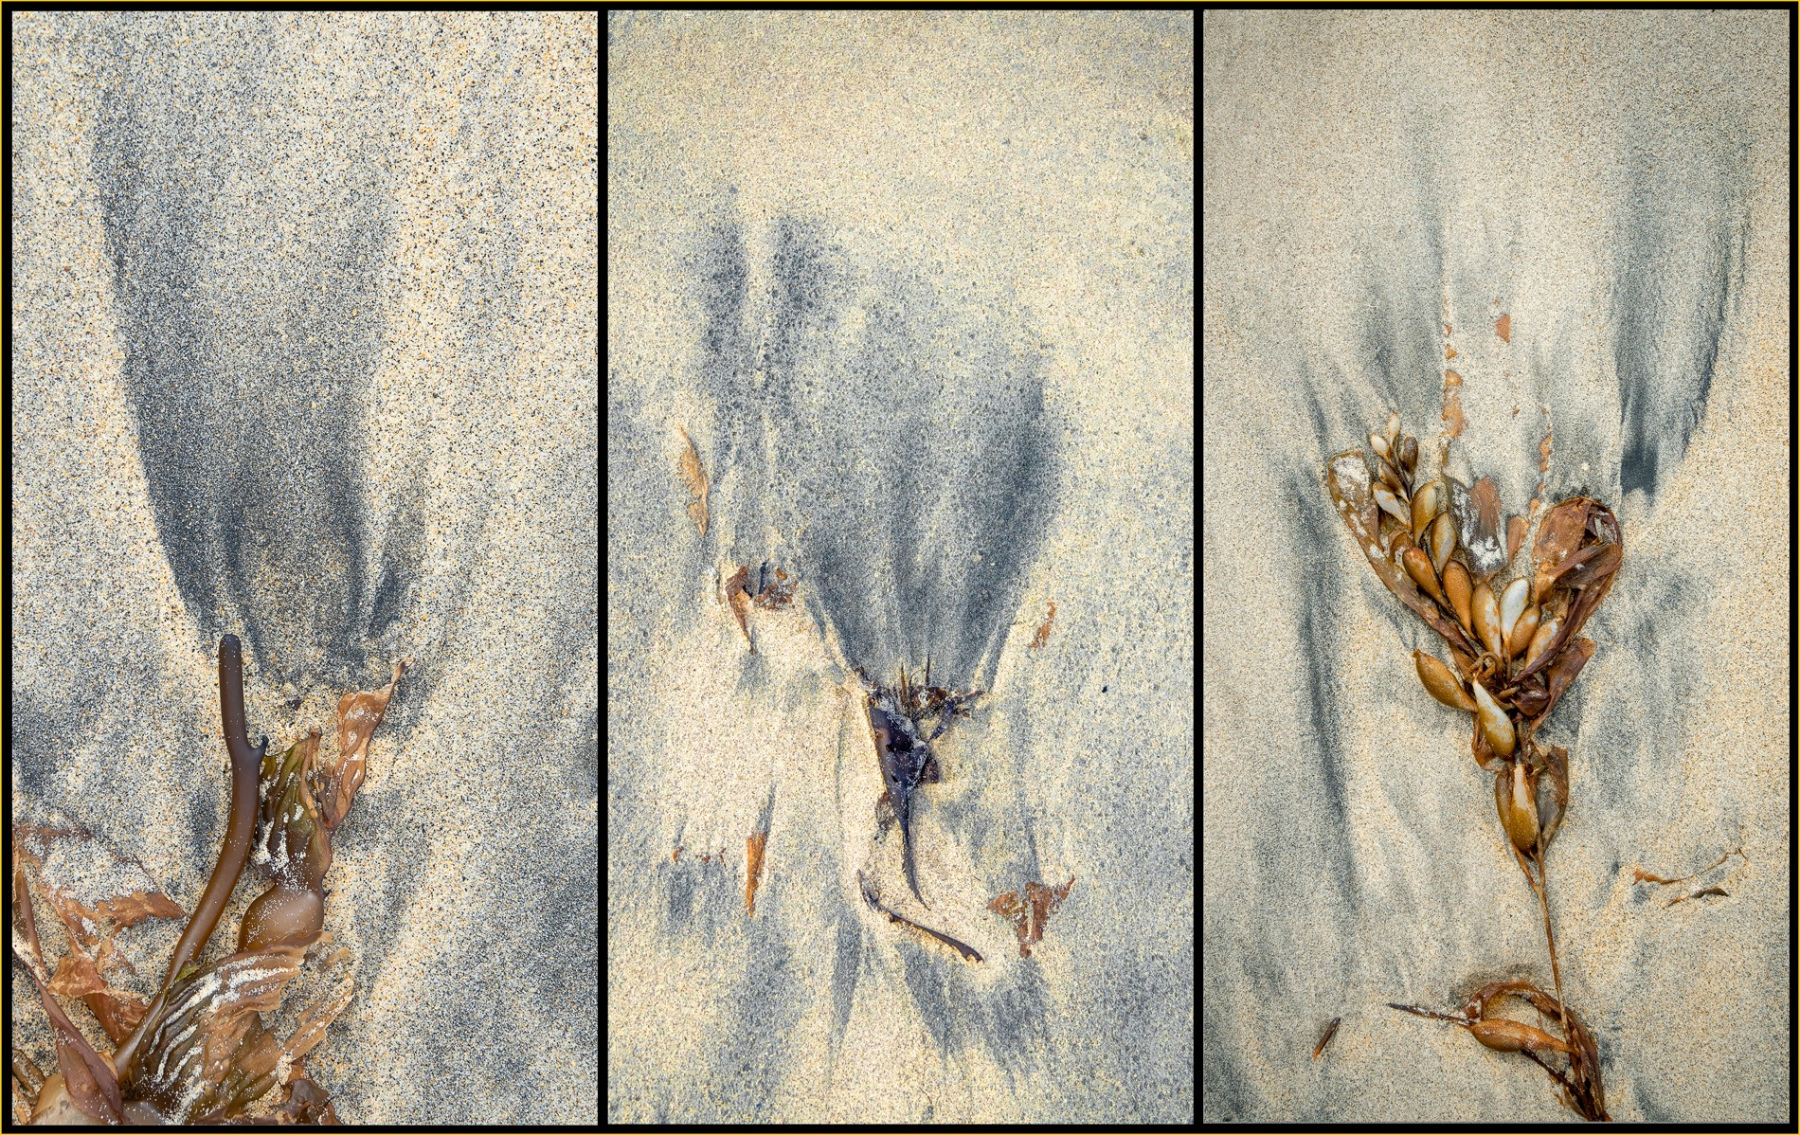 Linda-Bullimore-Black-Tulips-in-the-Sand-small